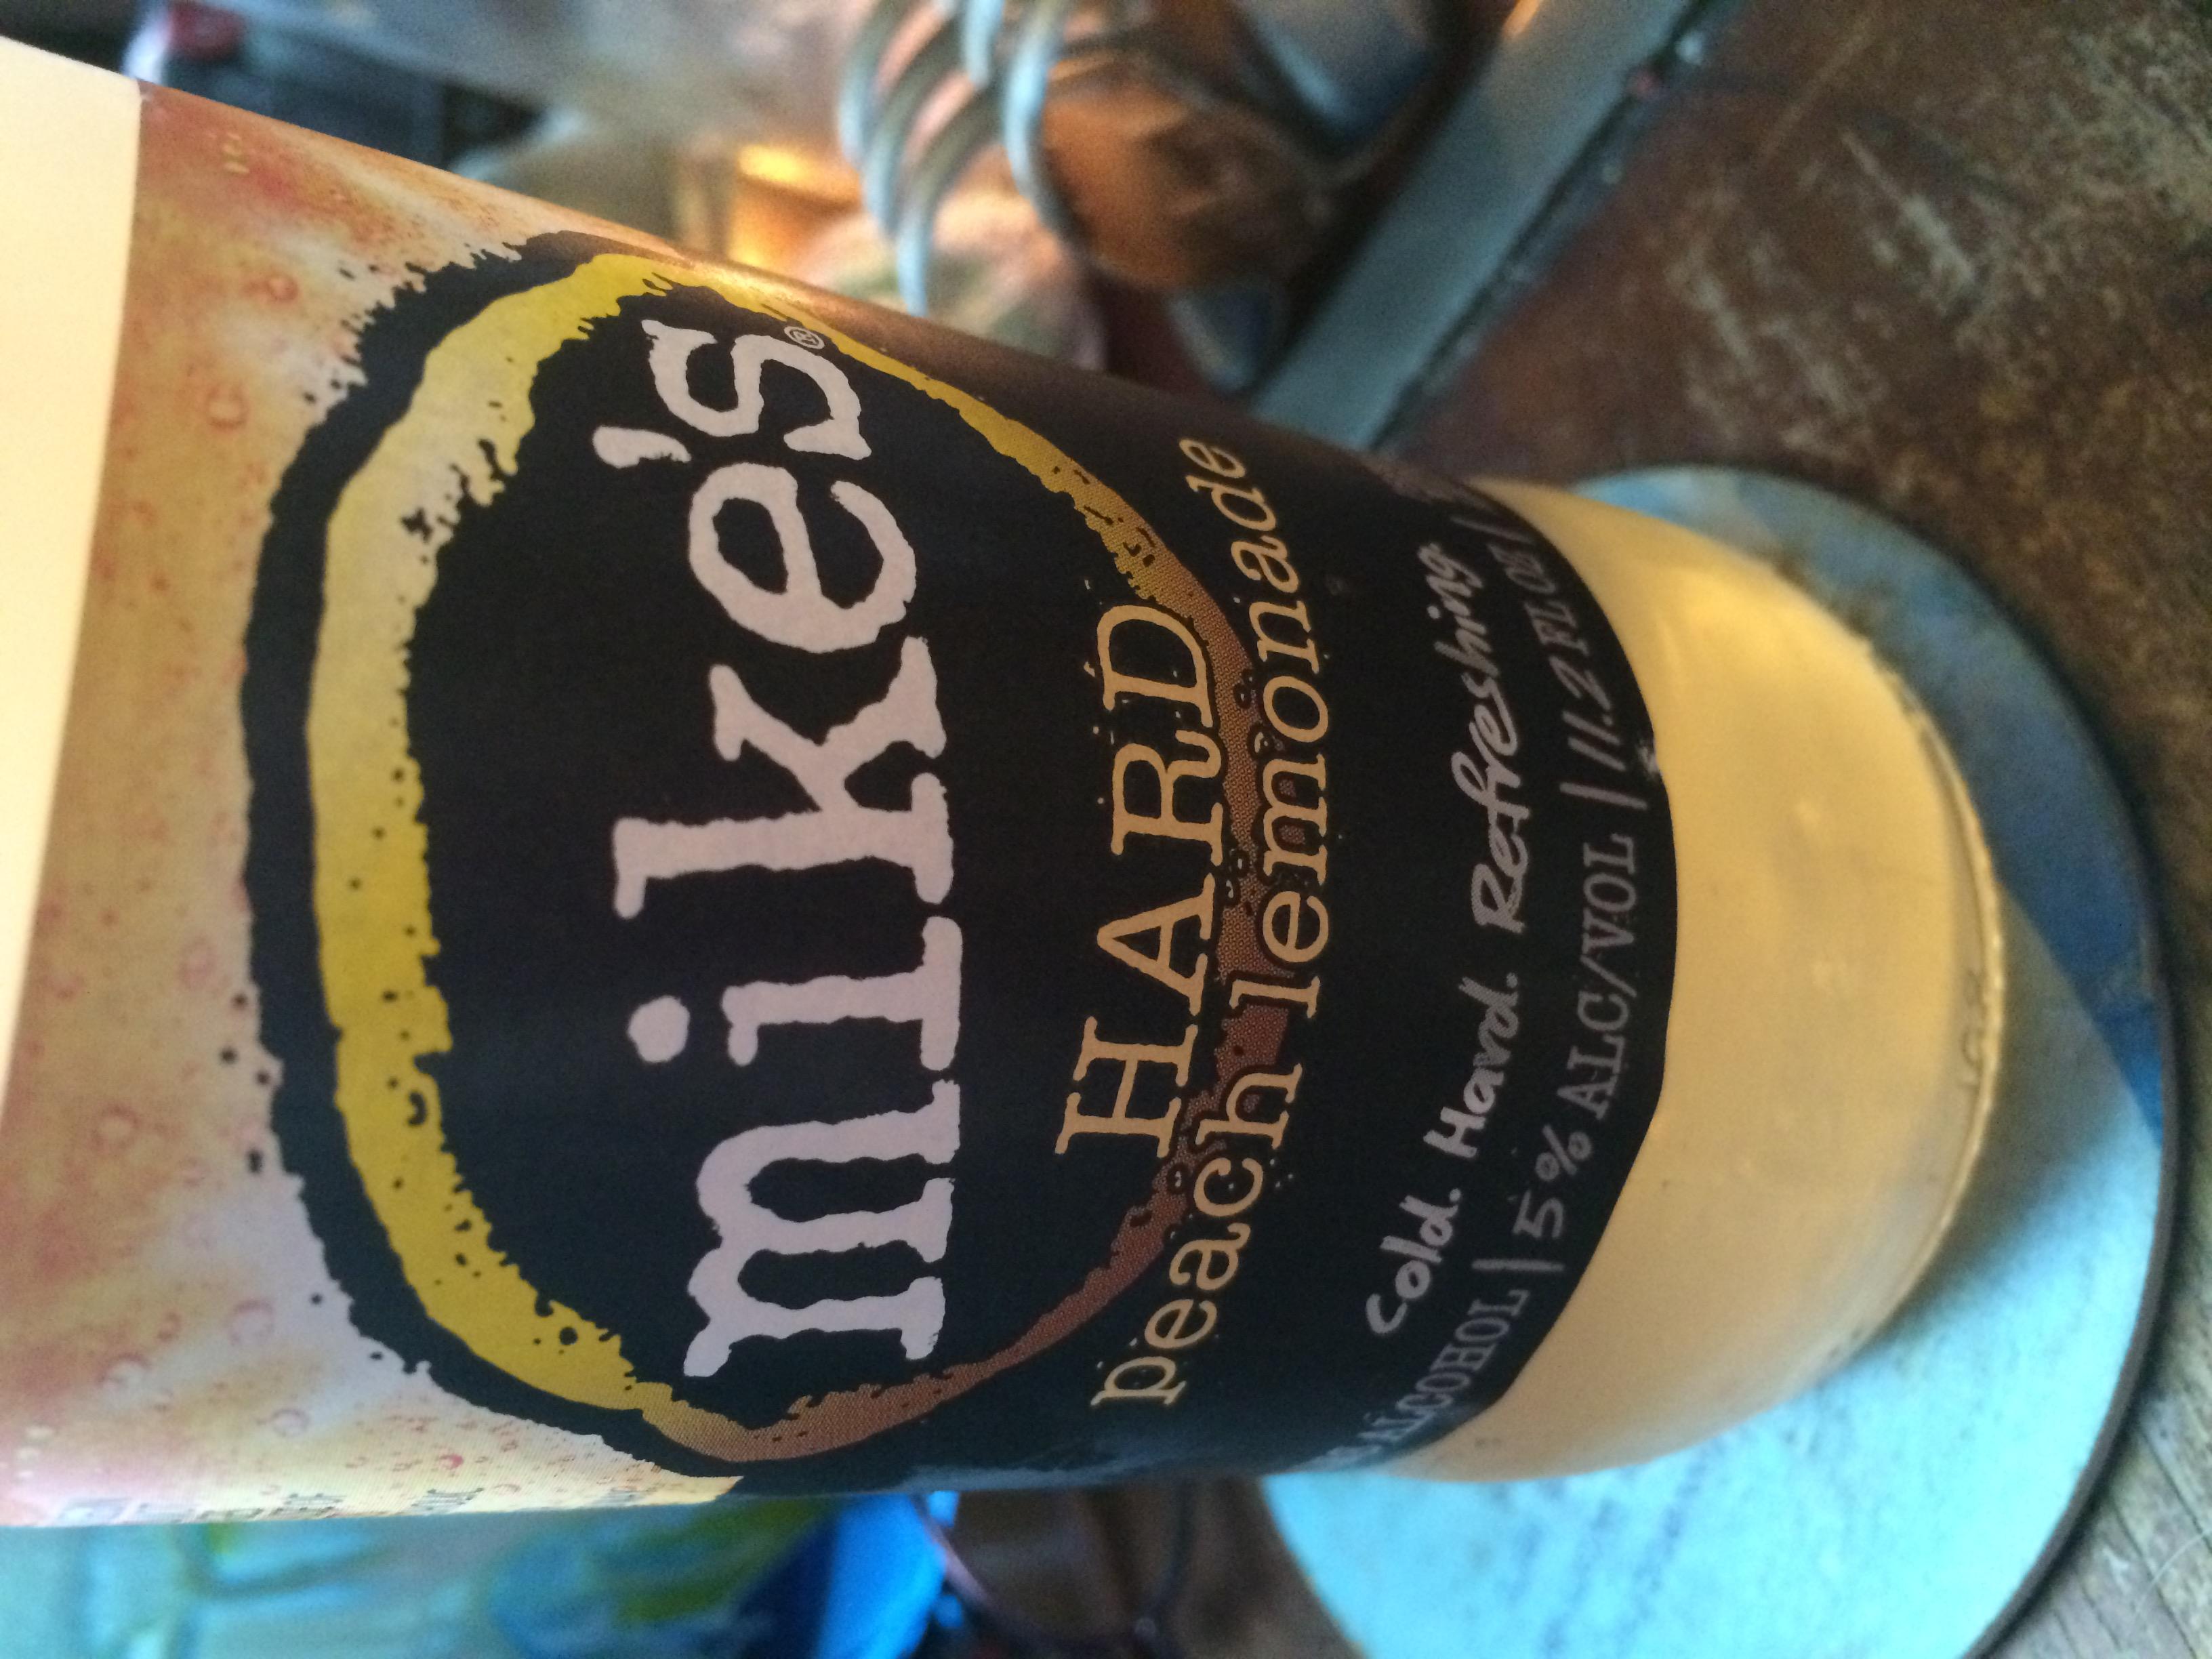 Mike's Hard Lemonade The Classic Peach Margarita Ultra Premium Malt Beverage, 6ct uploaded by Nanci A.